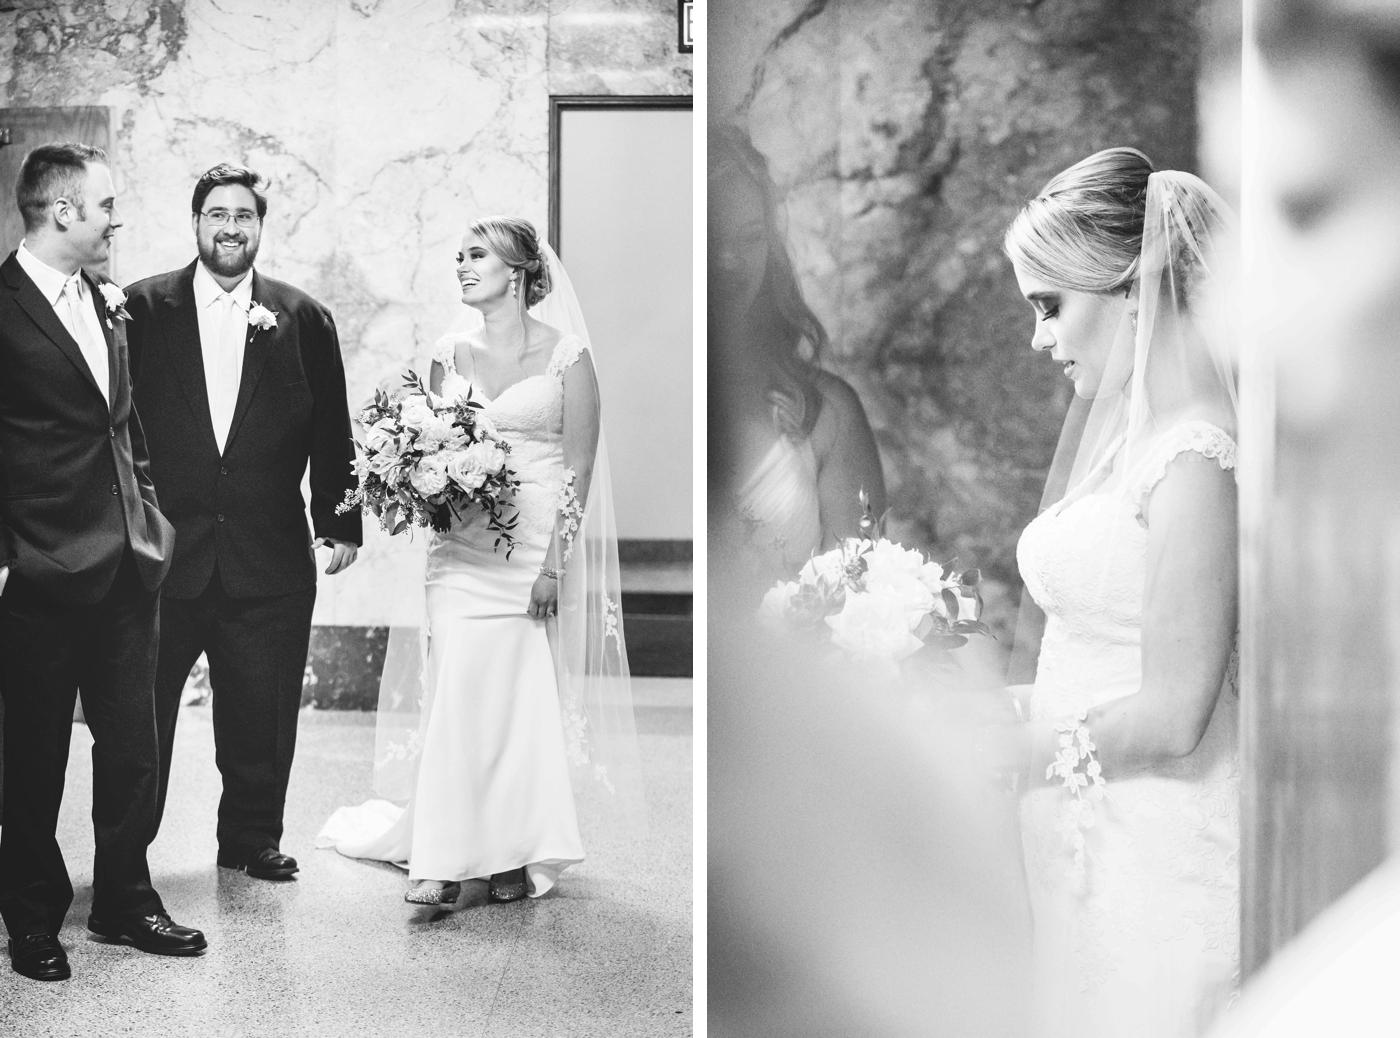 lake-geneva-fine-art-wedding-photography-mesley22